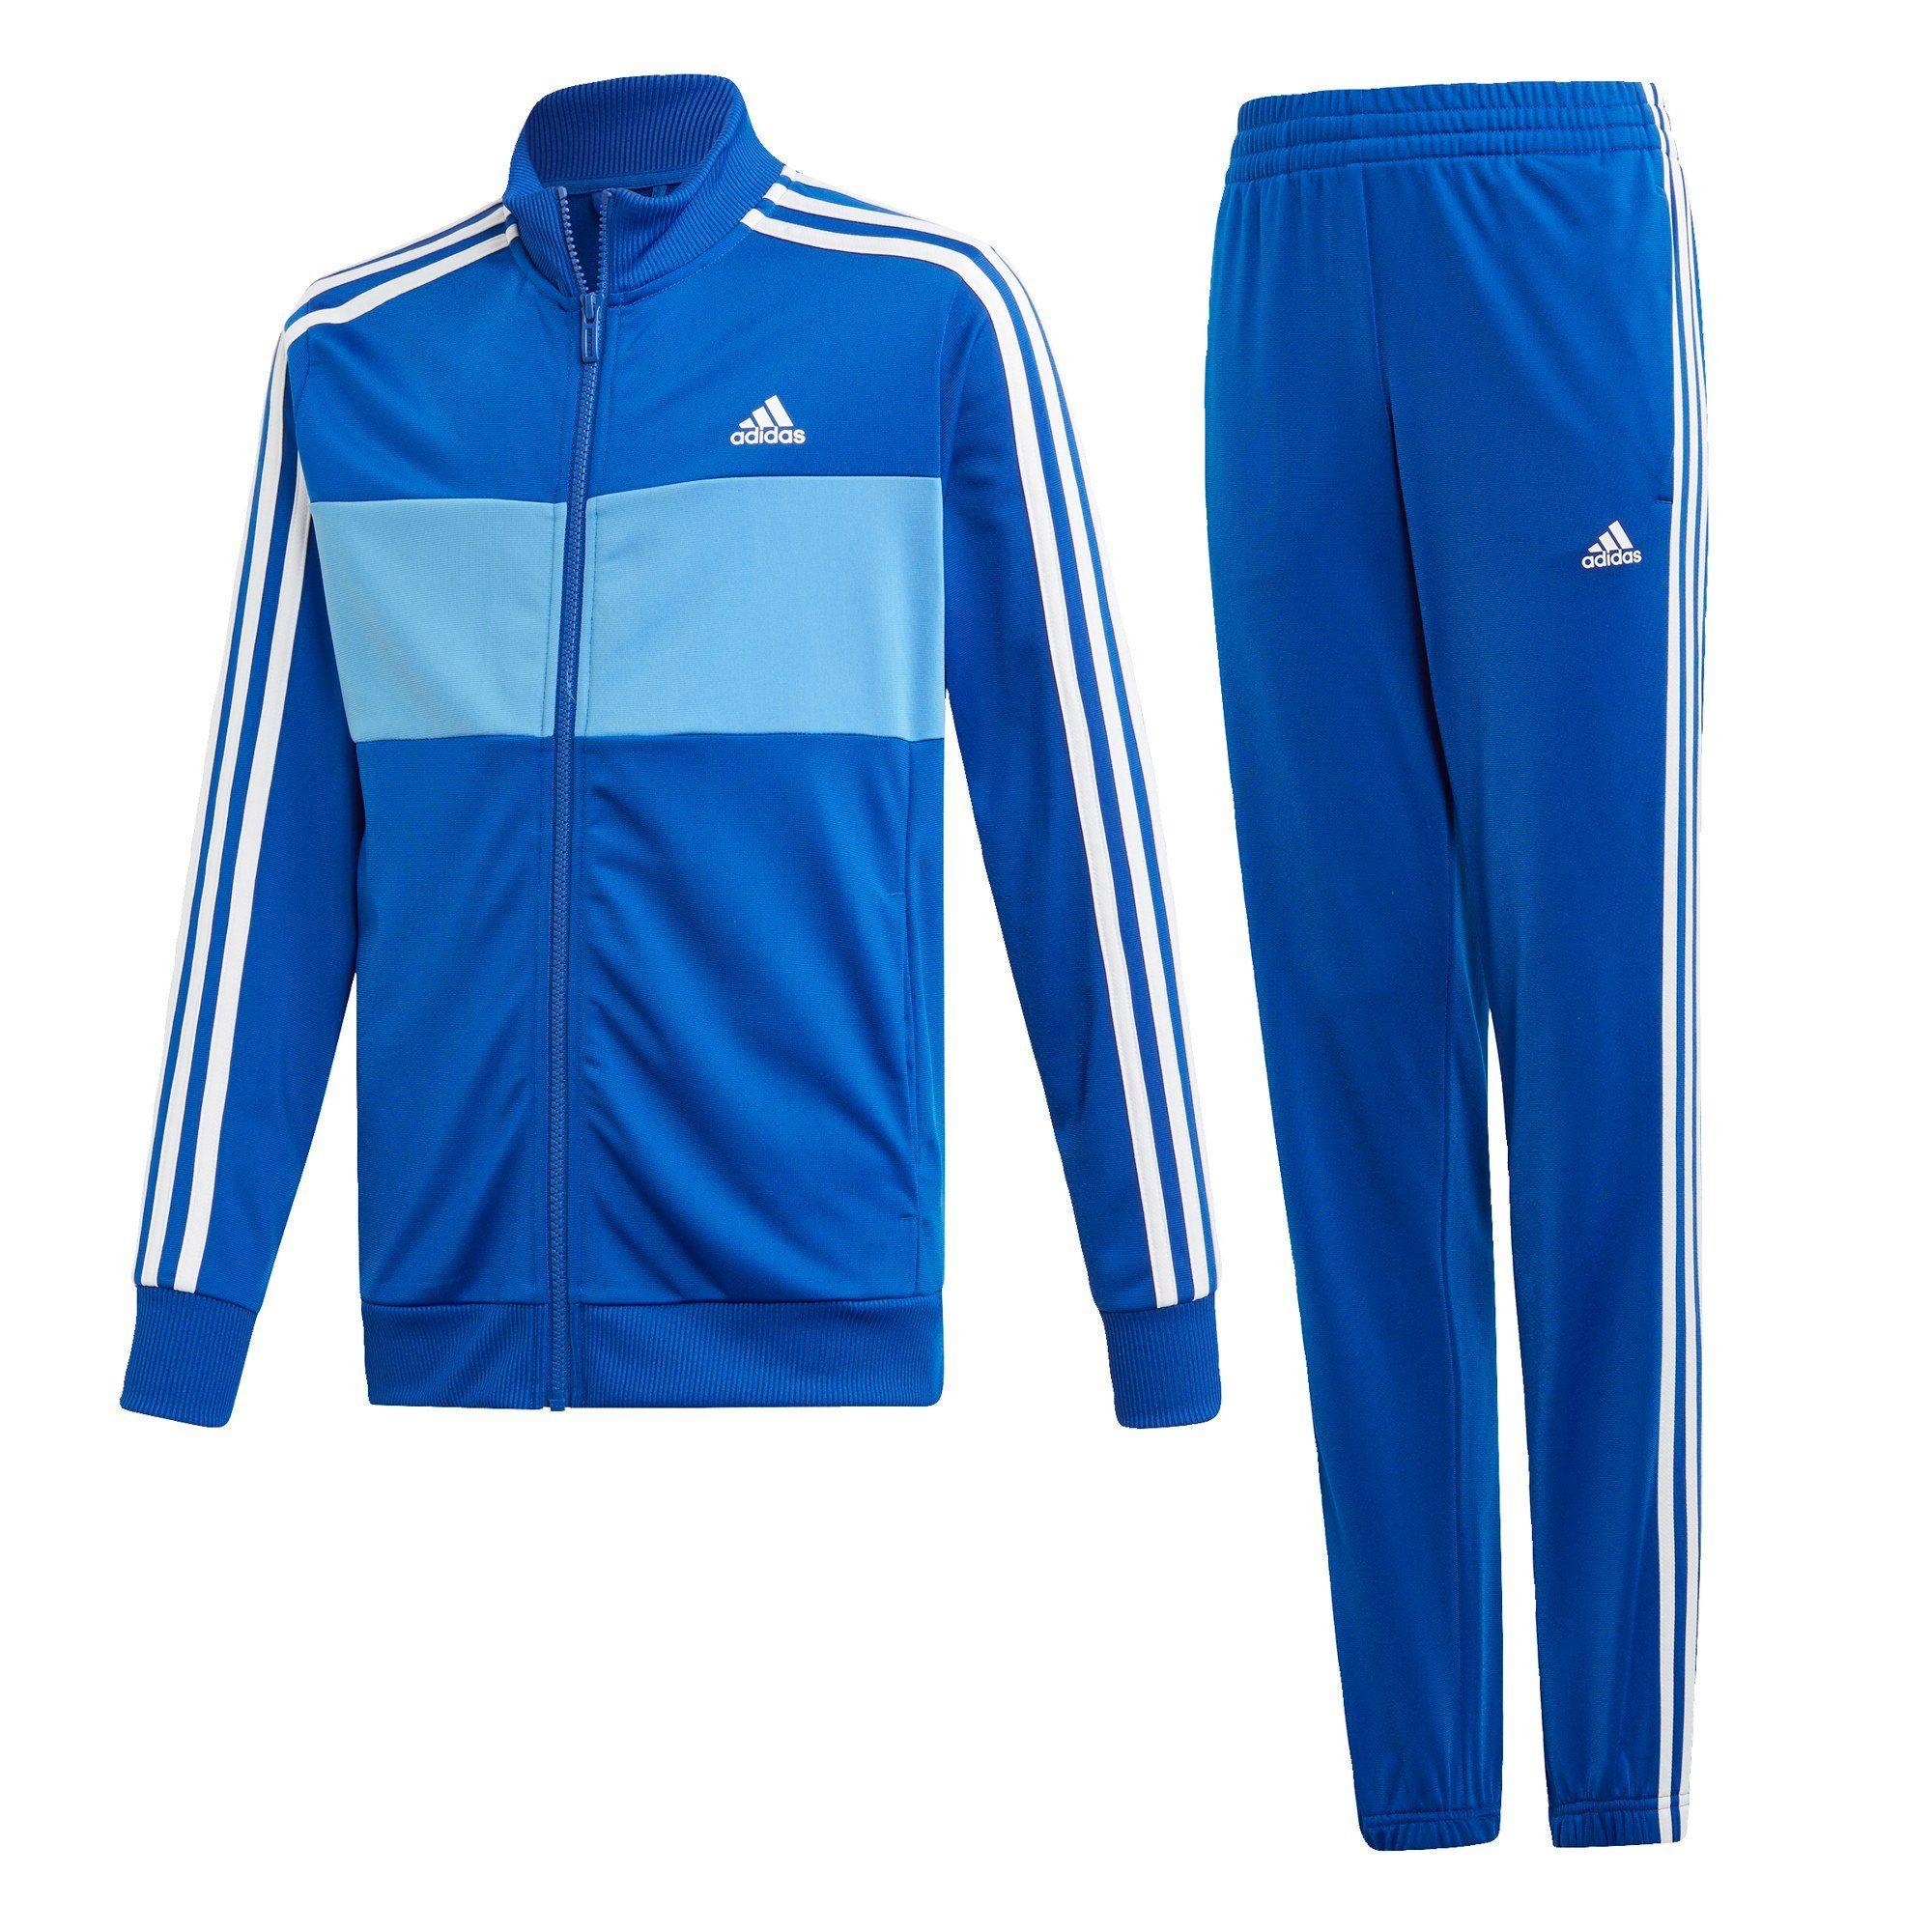 adidas Performance Trainingsanzug »Tiberio Trainingsanzug«, Jacke und Hose: 100 % recycelter Polyester (Trikot) online kaufen | OTTO